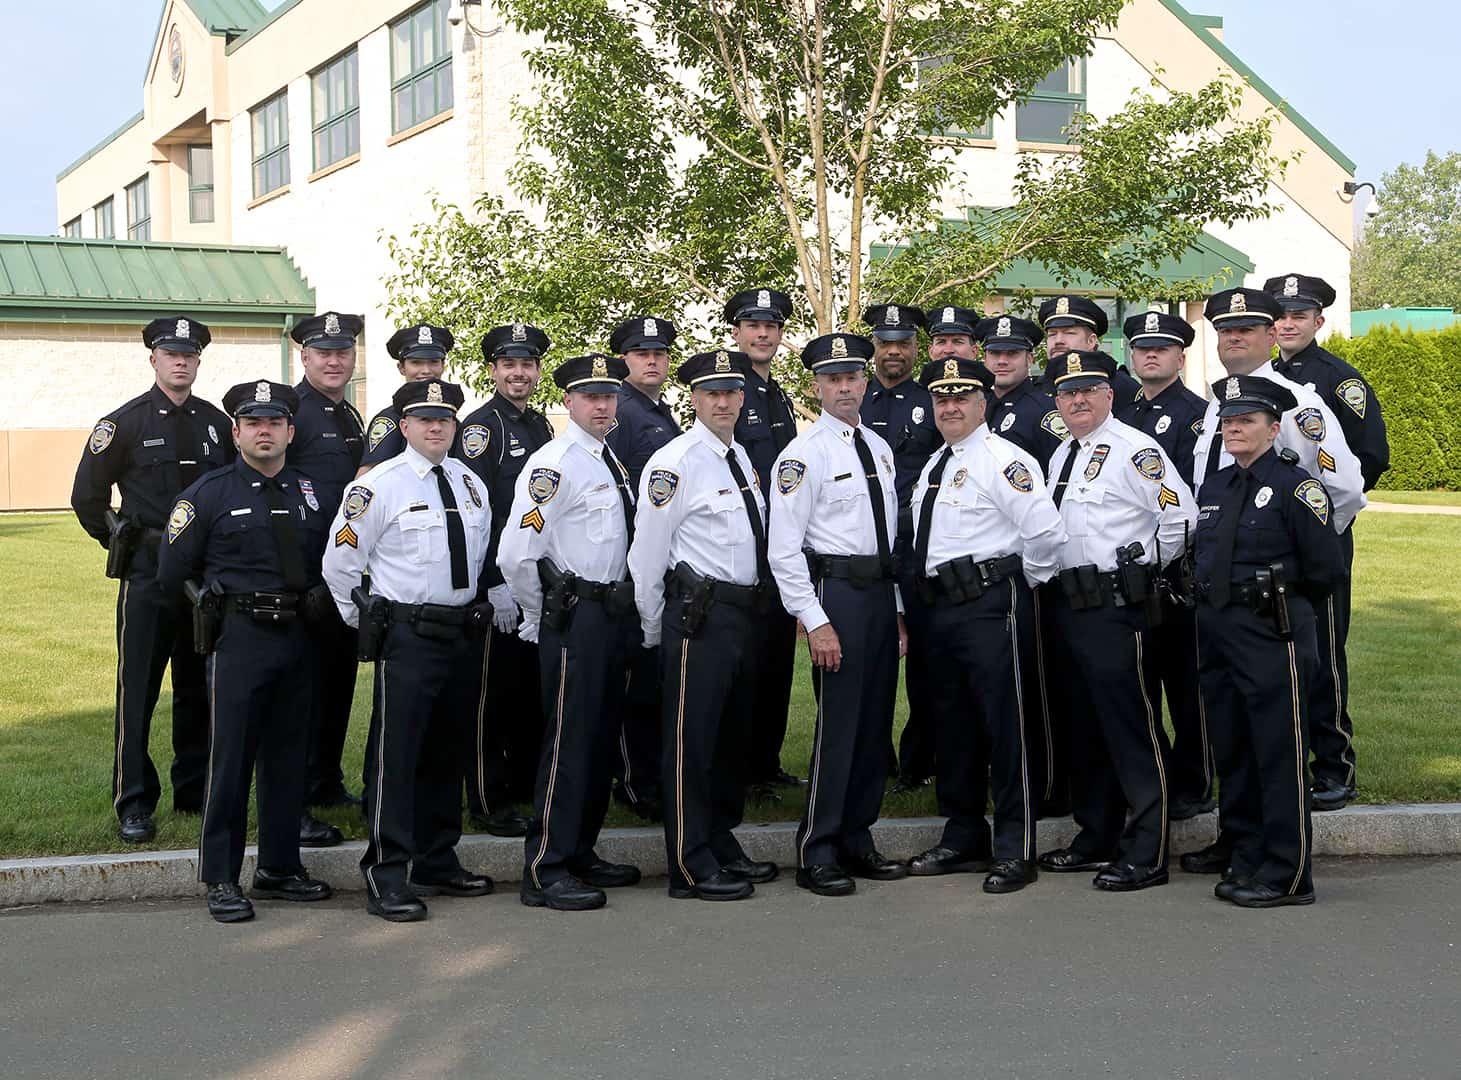 Plainville Police Department